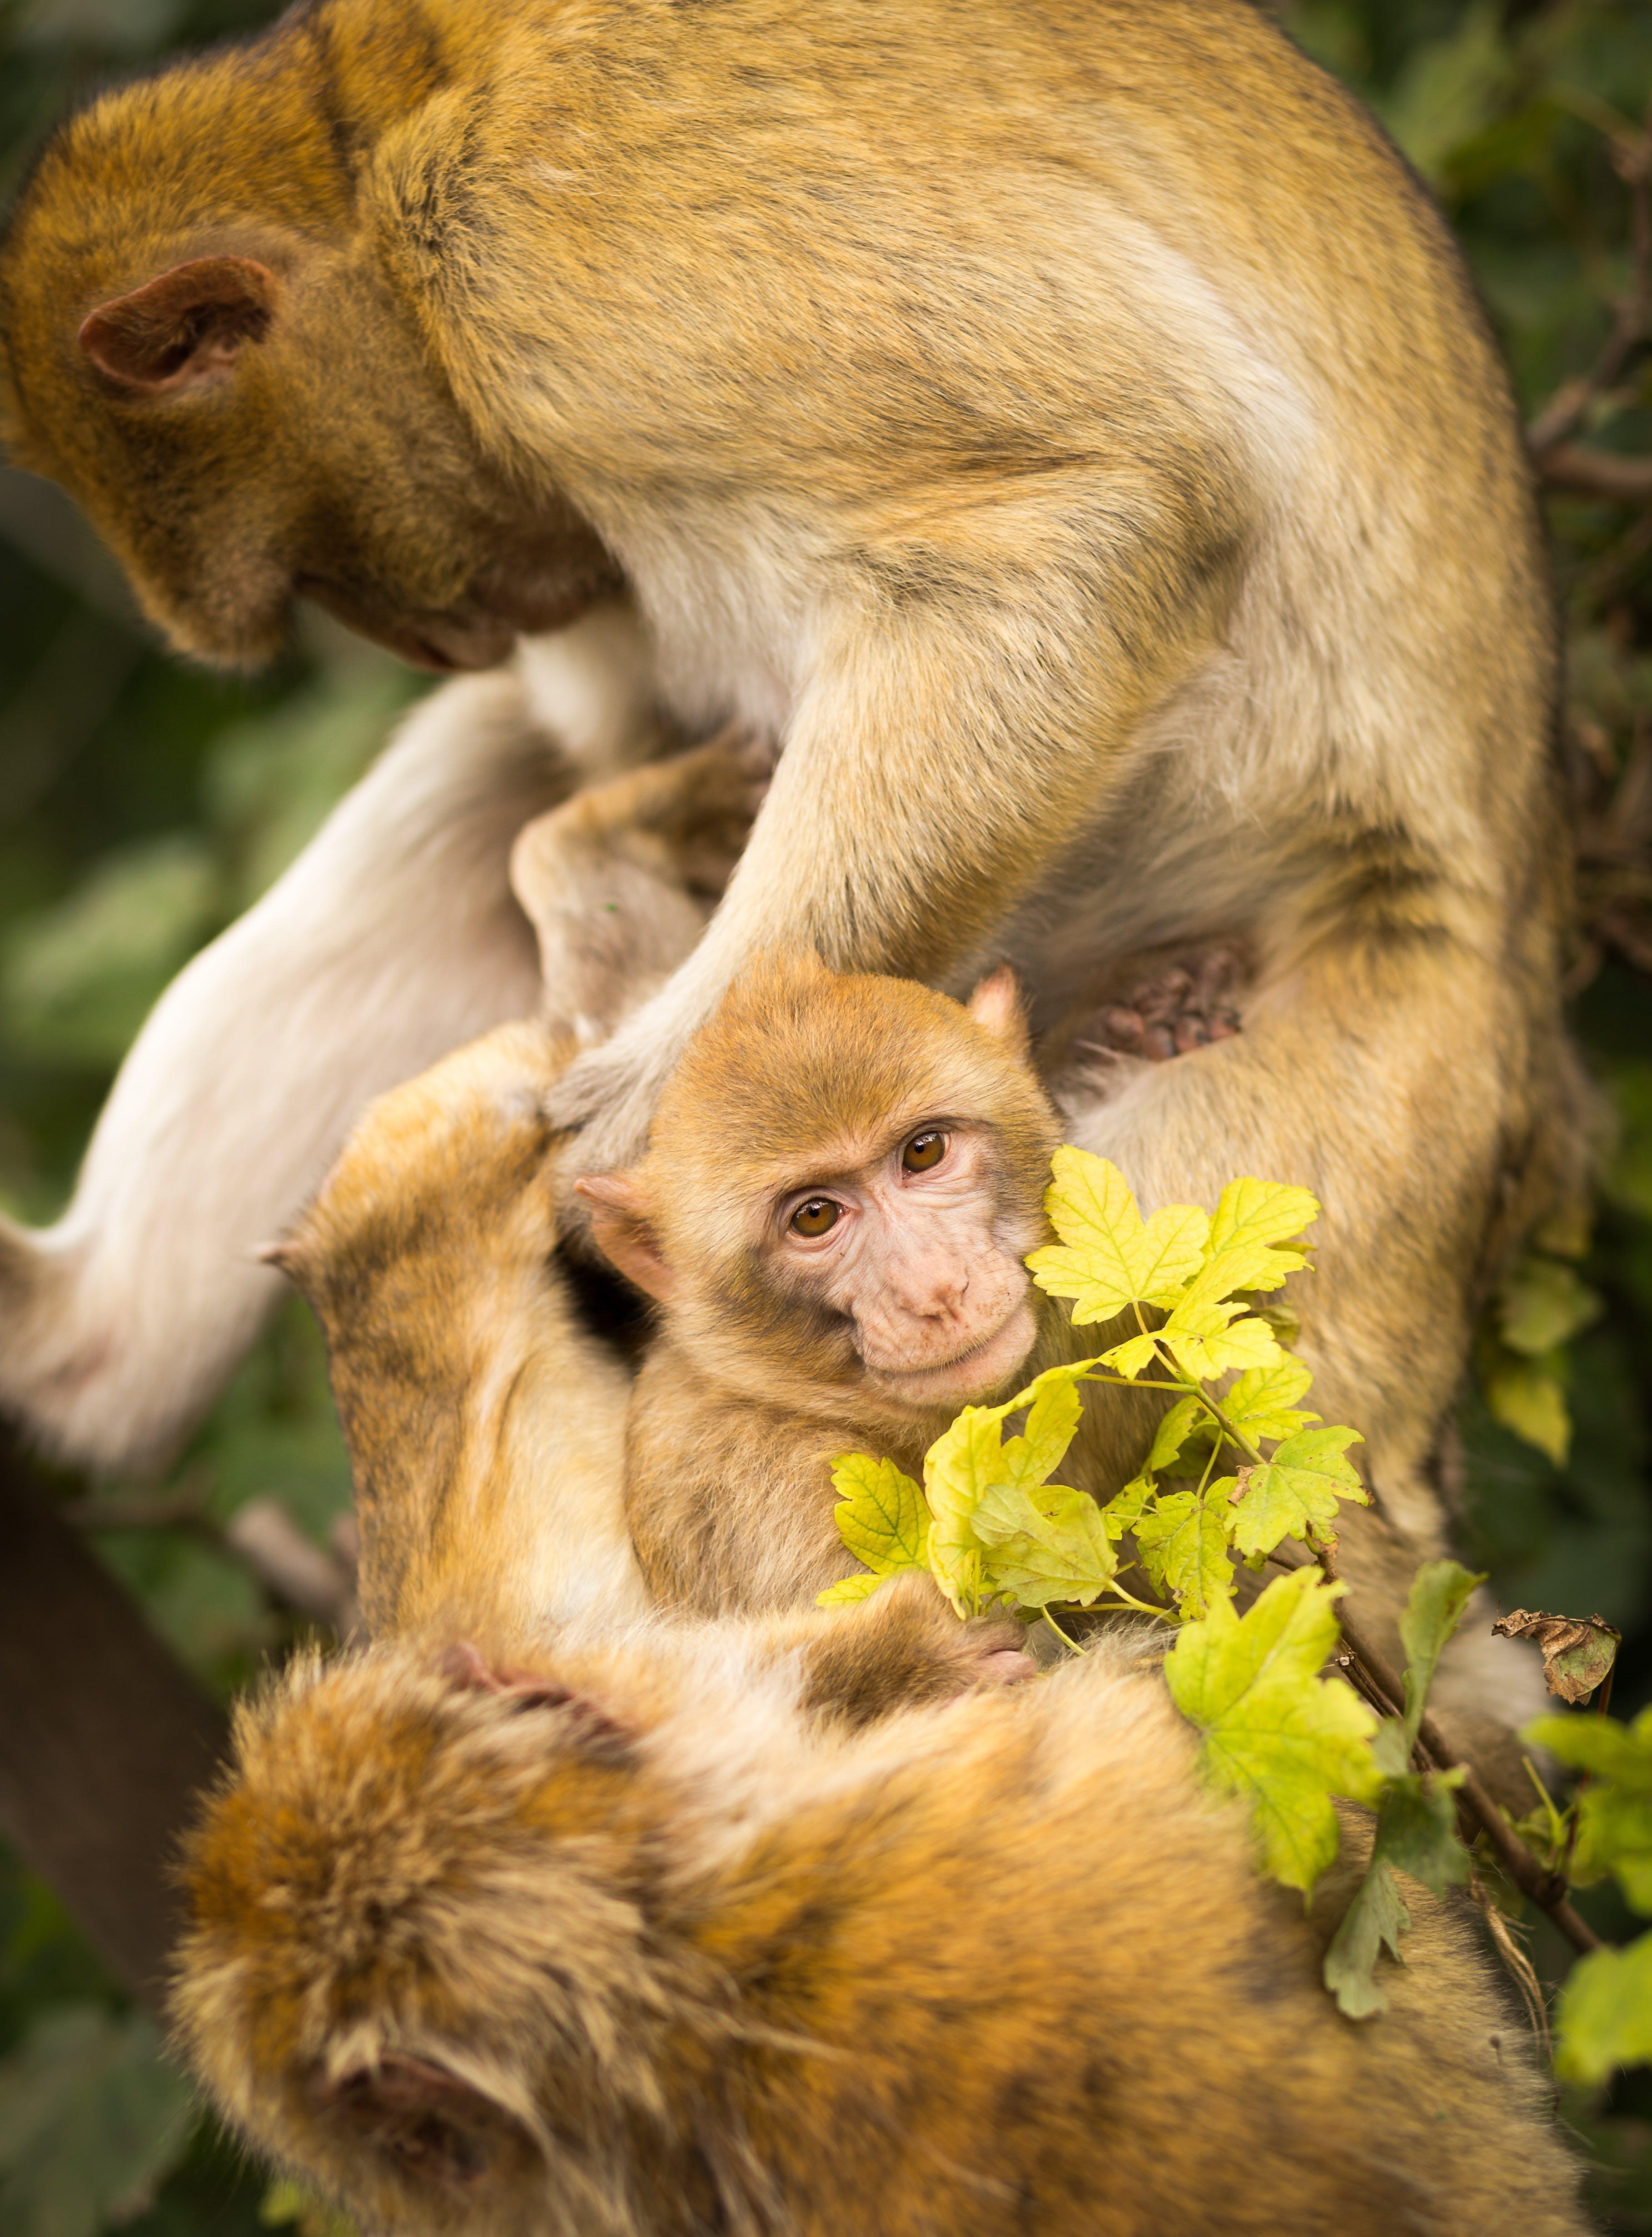 Free stock photo of cute, animals, monkeys, close-up